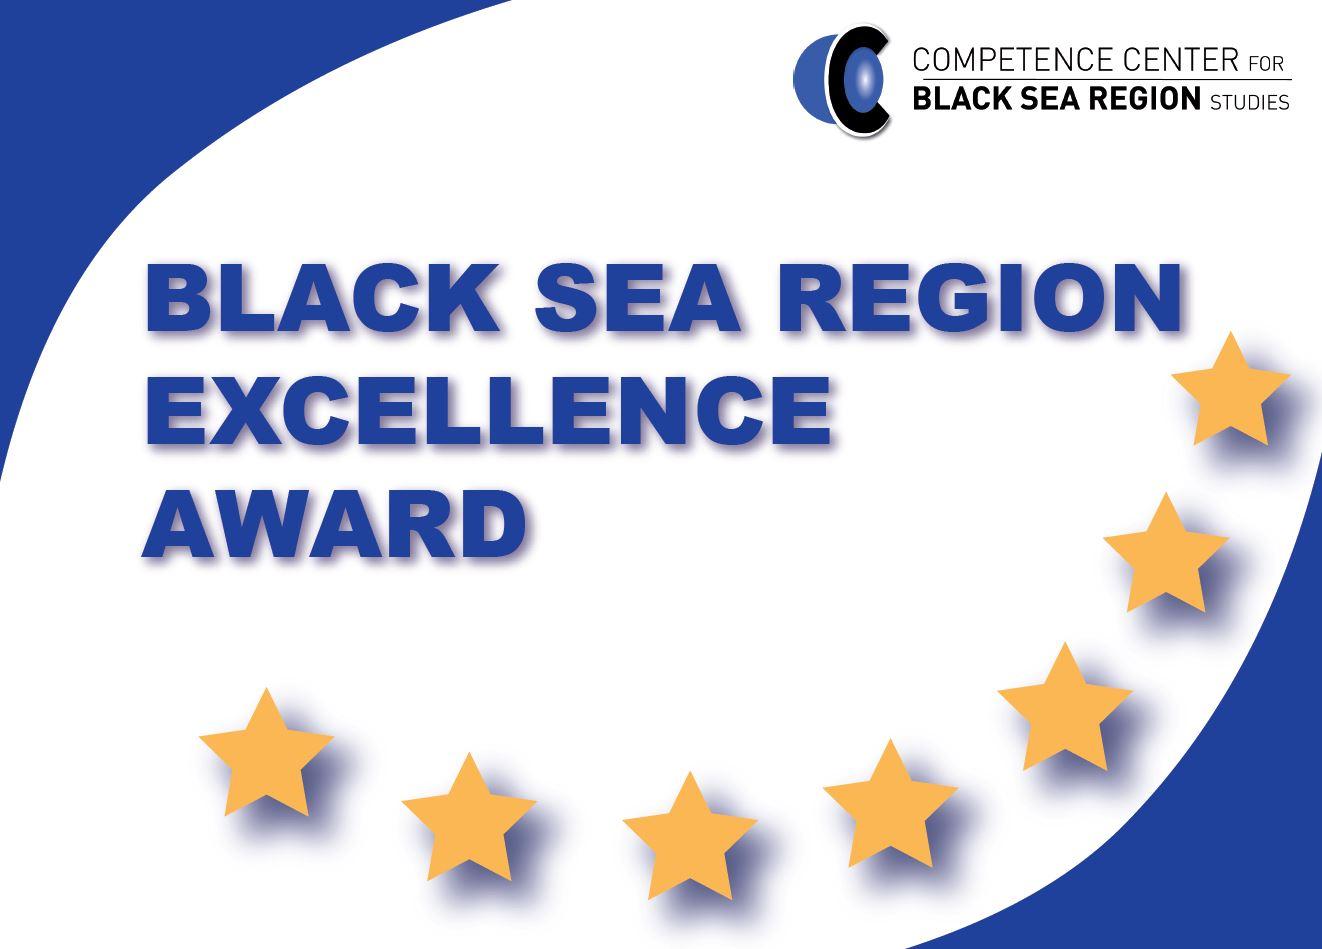 Black Sea Region Excellence Award